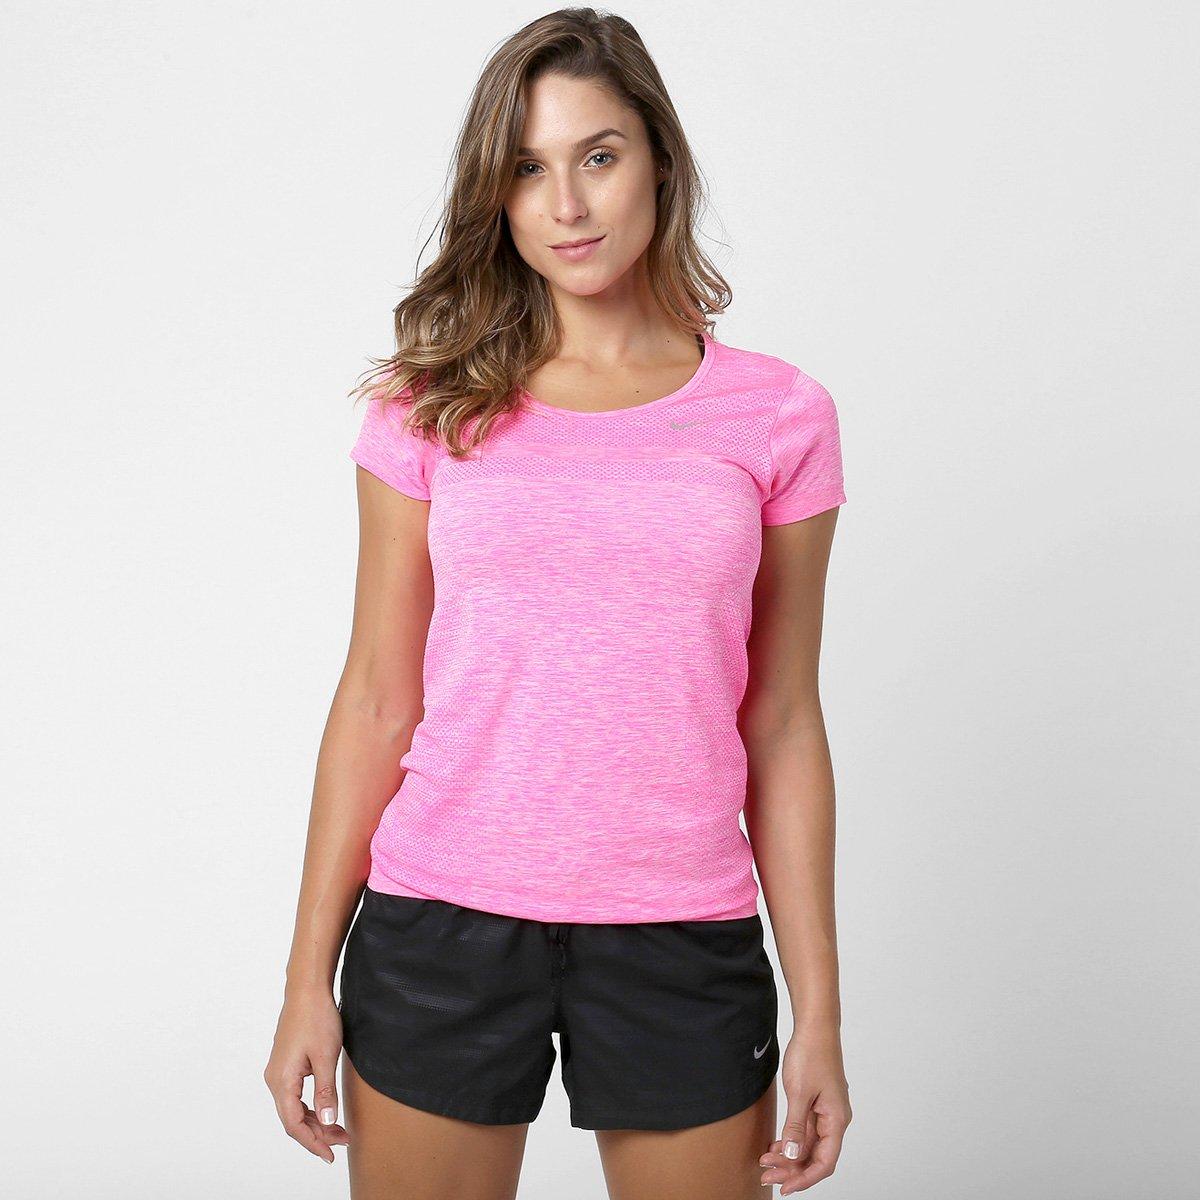 04bca6c924 Camiseta Nike Dri-Fit Knit - Compre Agora